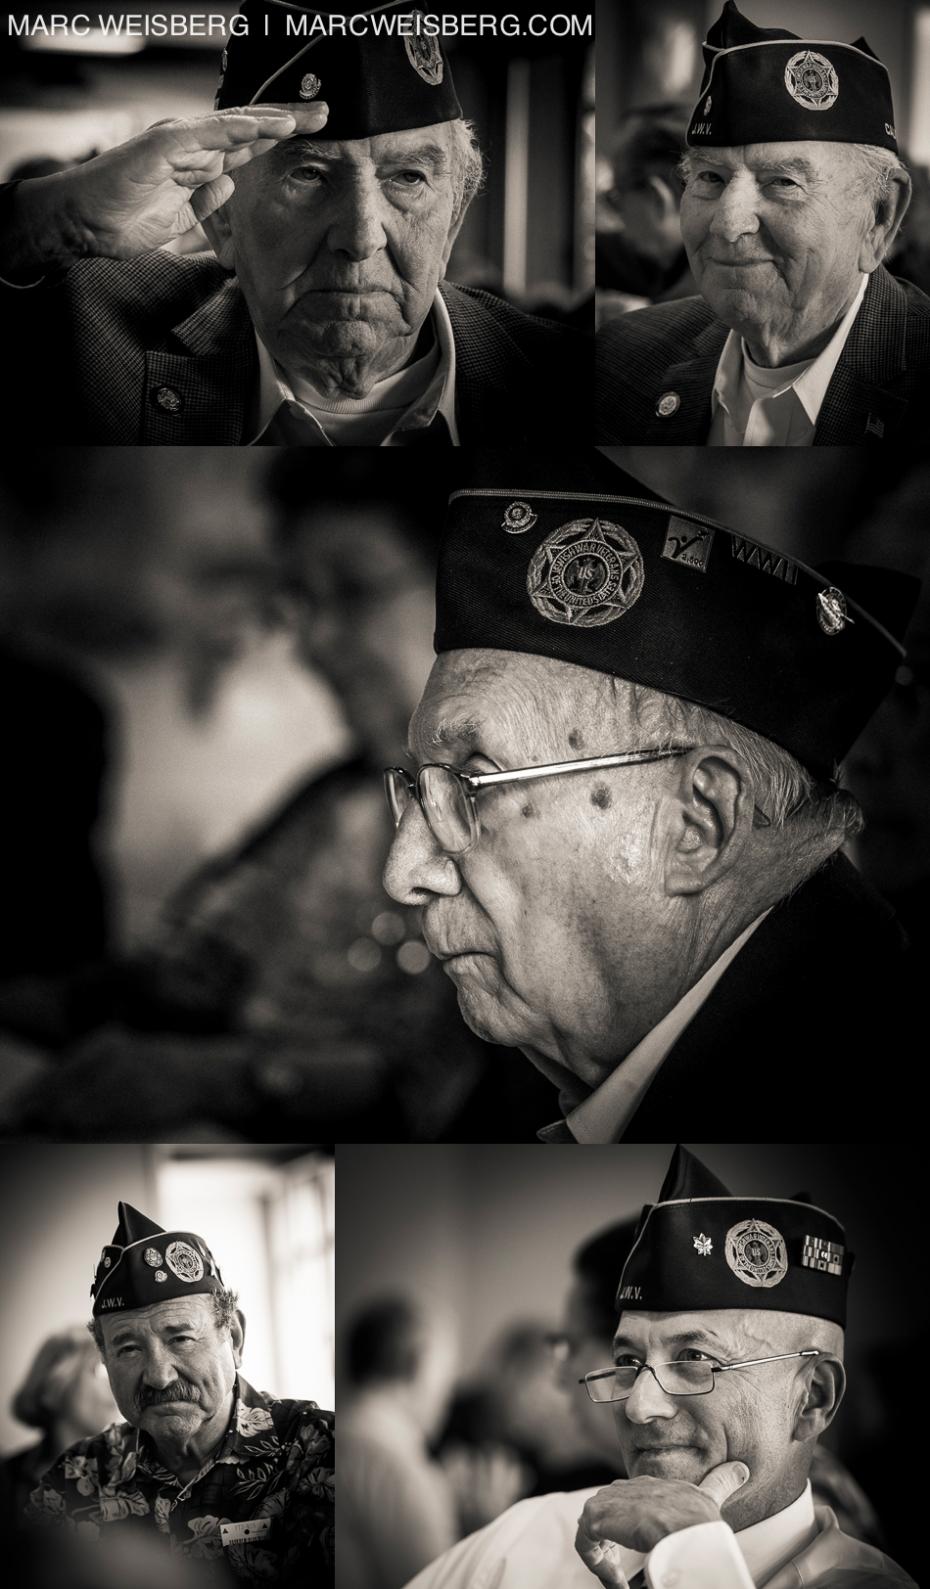 historic black and white portraits of jewish world ward II veterans